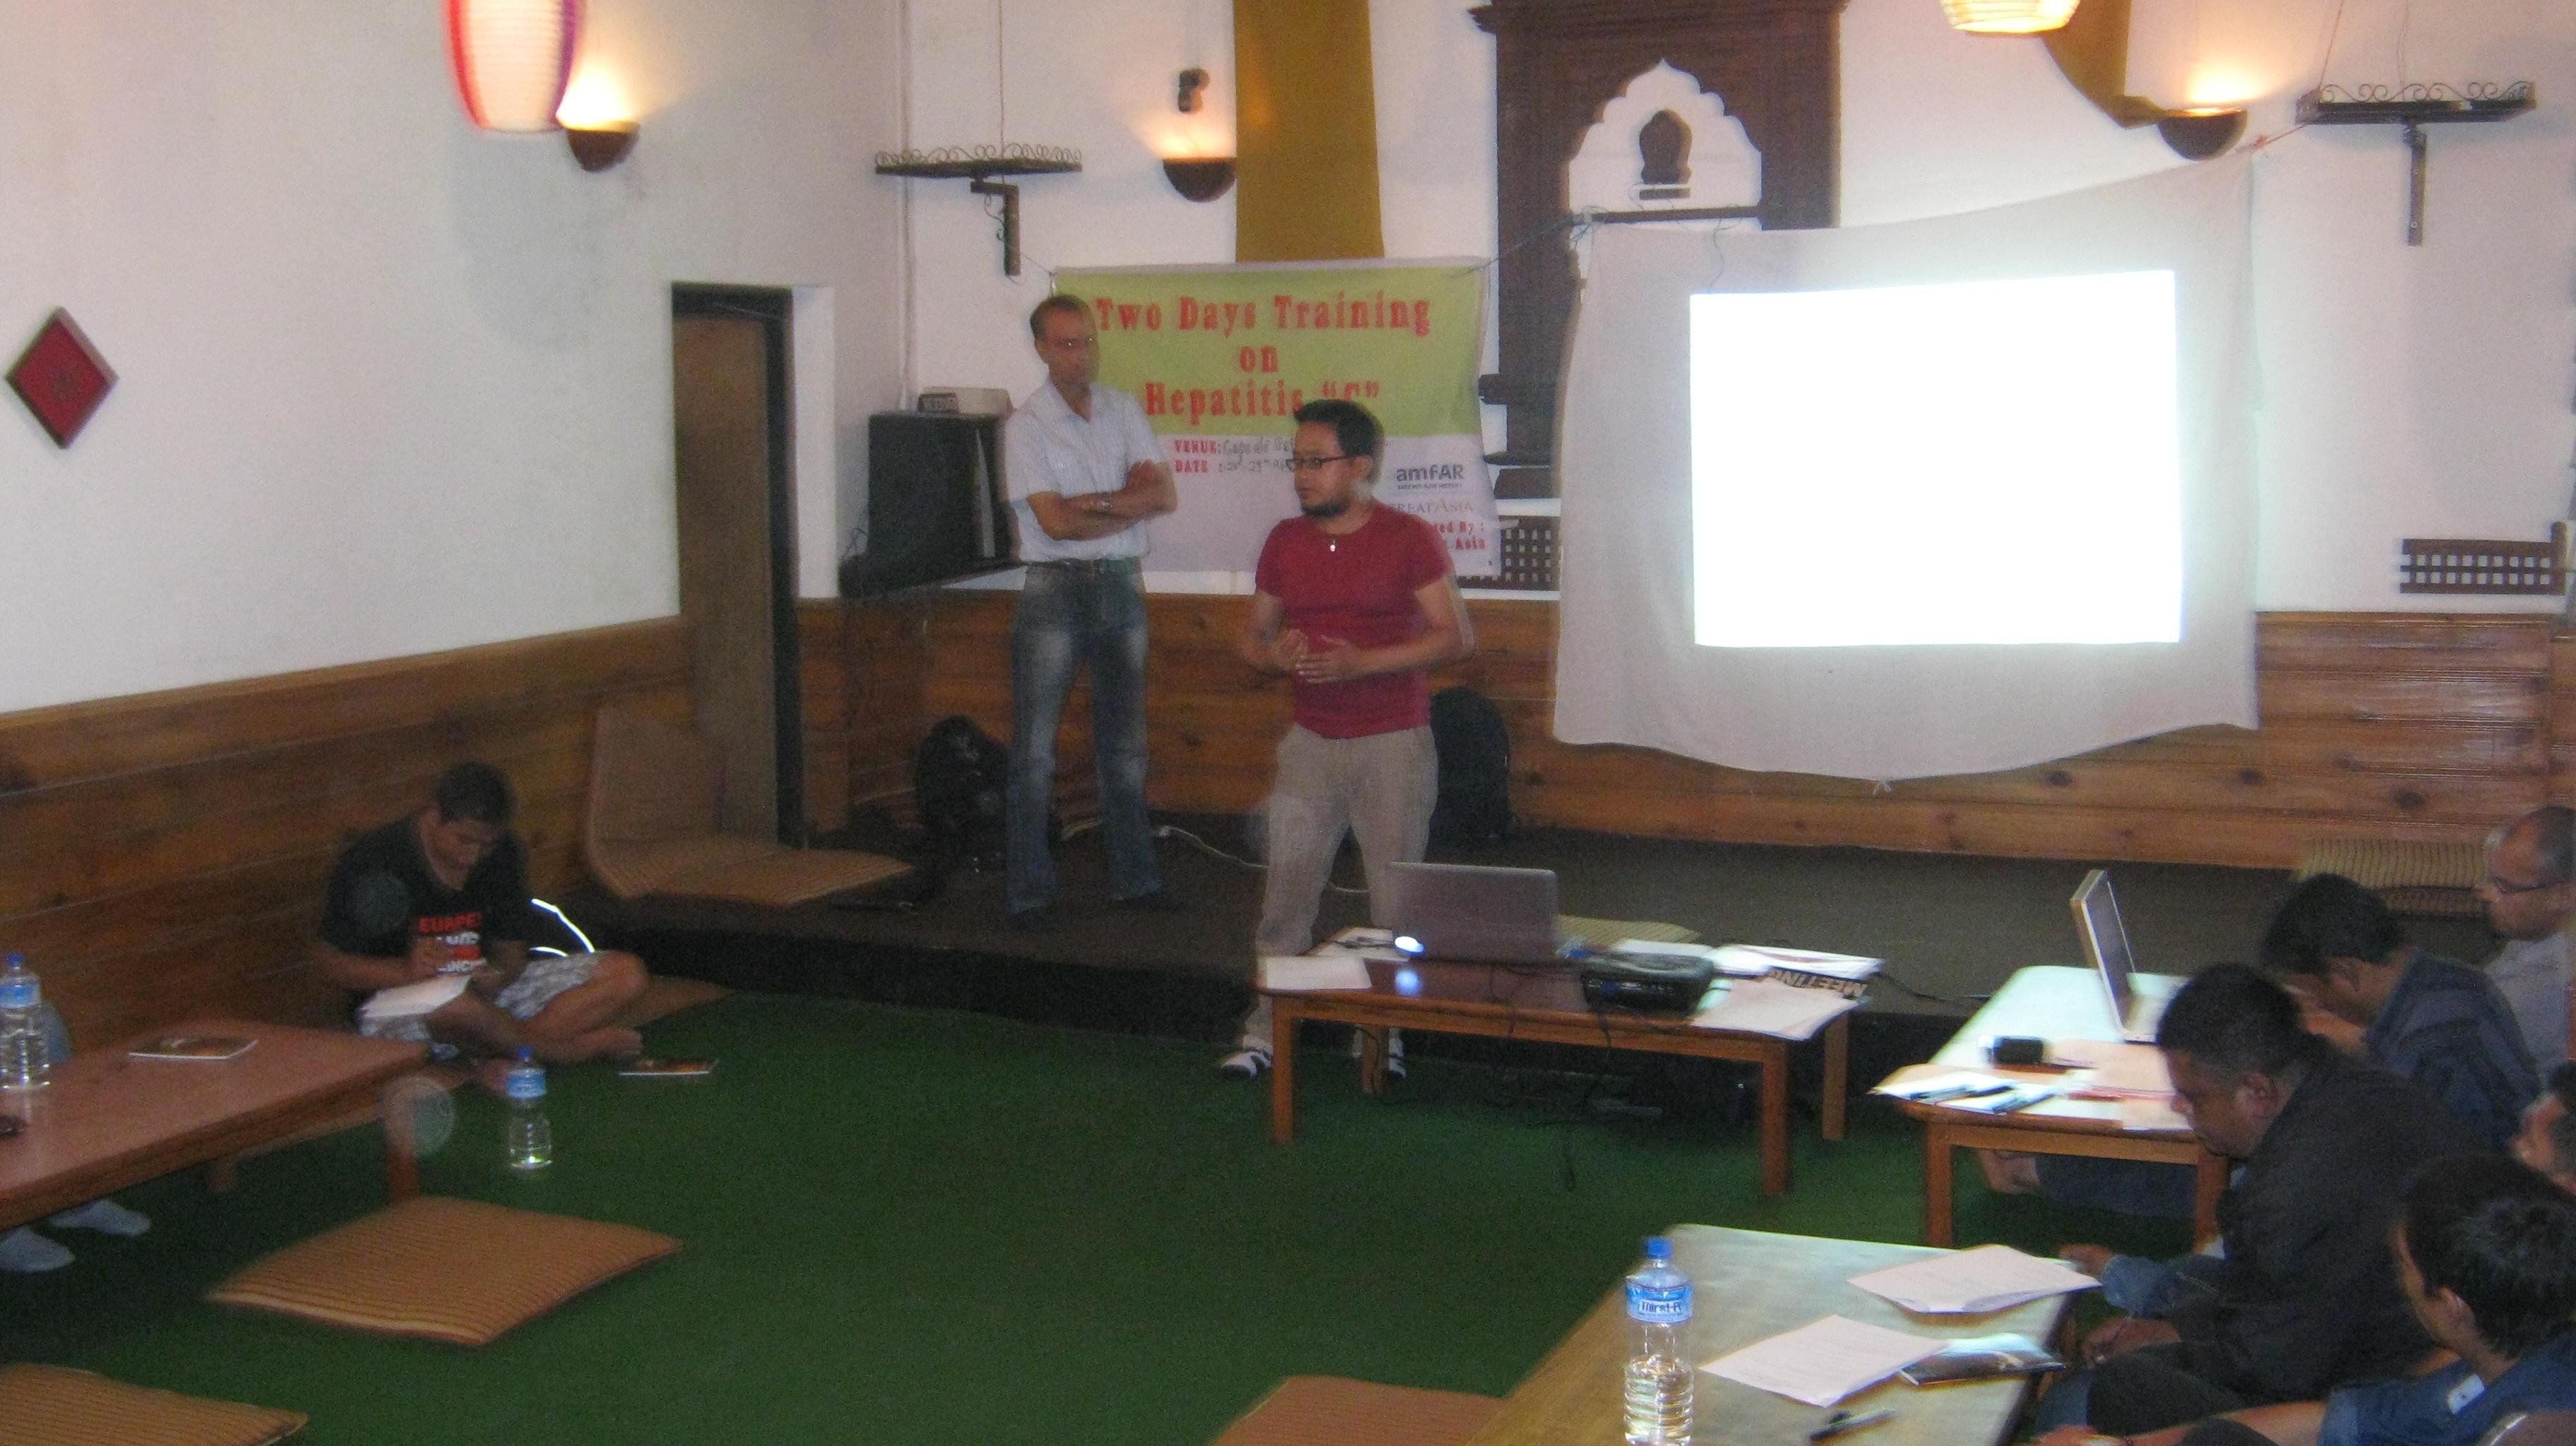 2nd Training Program on Hepatitis C